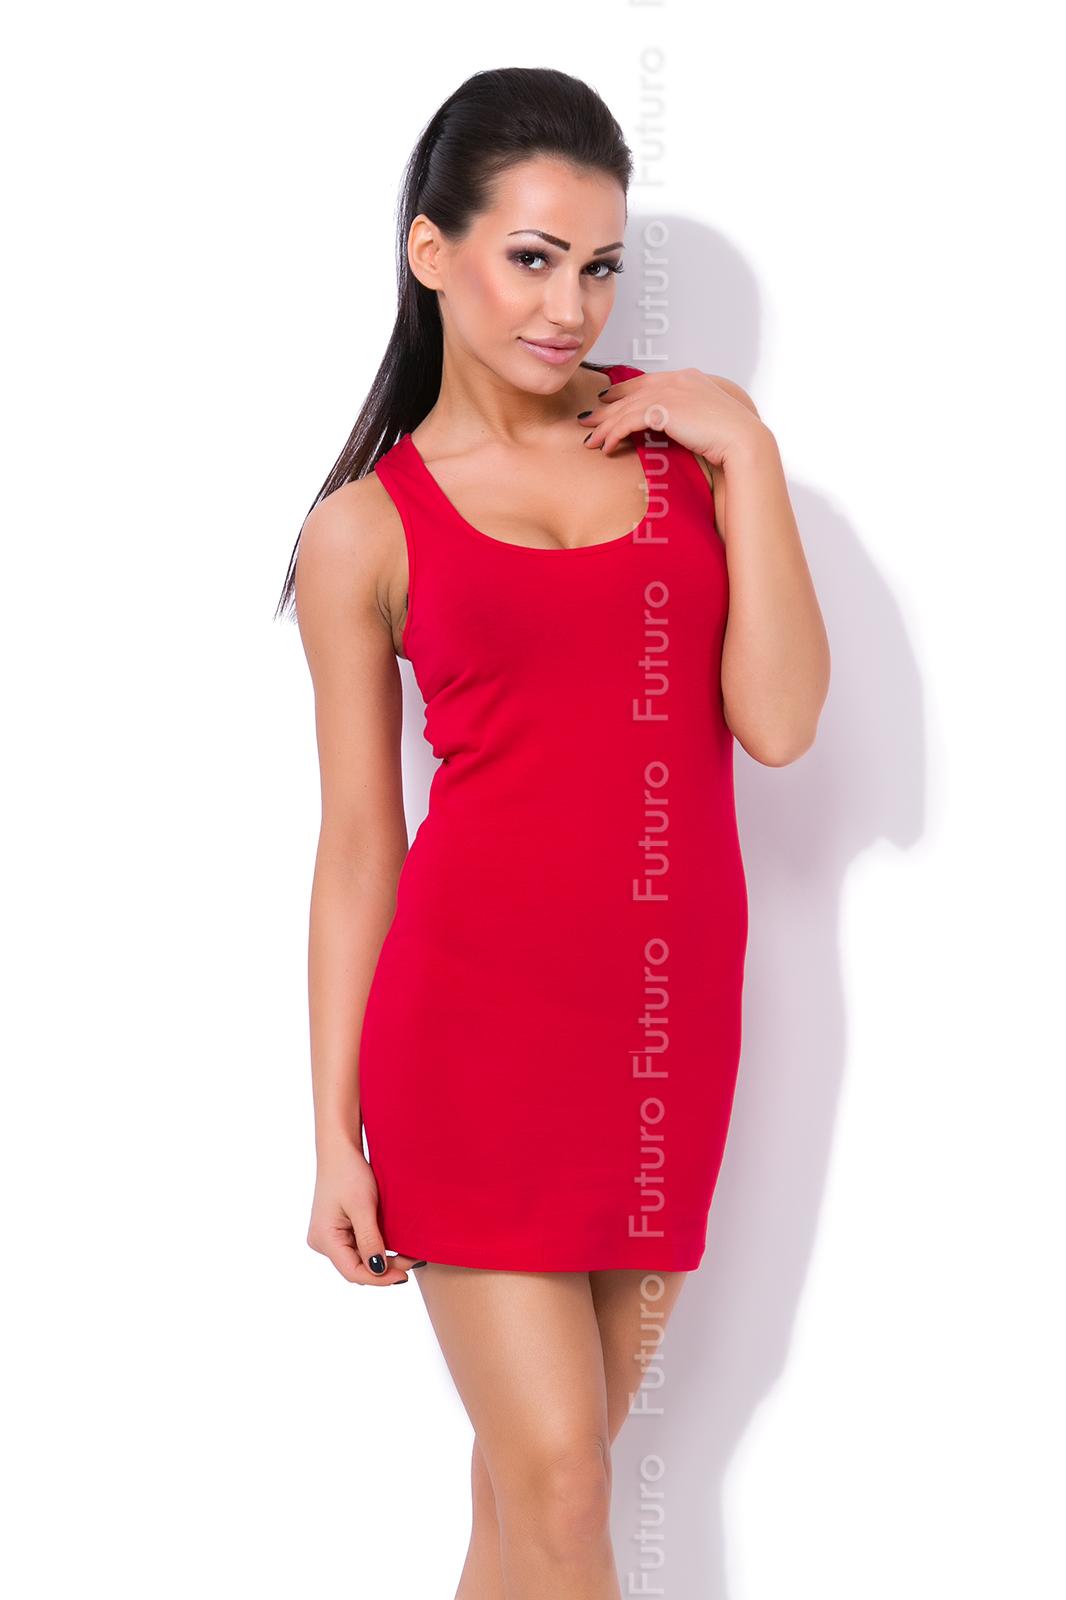 Womens Summer Casual Vest Tank Top Plain Boxer T-Shirt One Size 8-12 FT1003